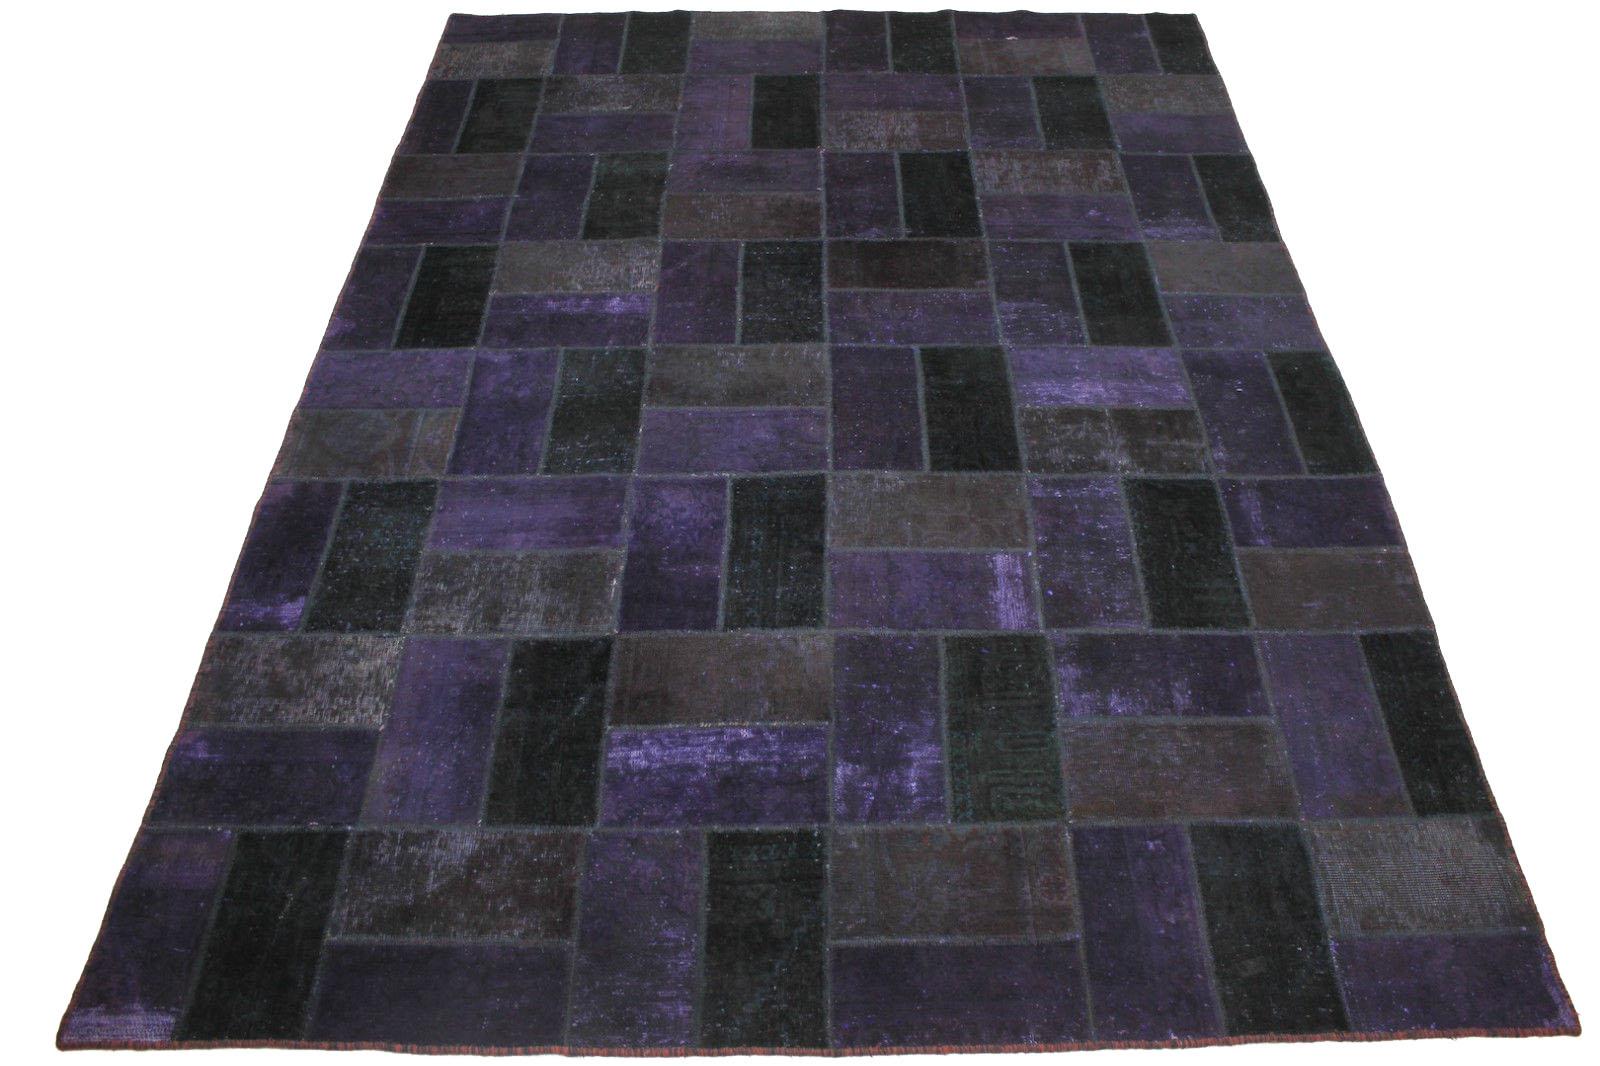 patchwork teppich lila in 320x240cm 1001 1829 bei kaufen. Black Bedroom Furniture Sets. Home Design Ideas